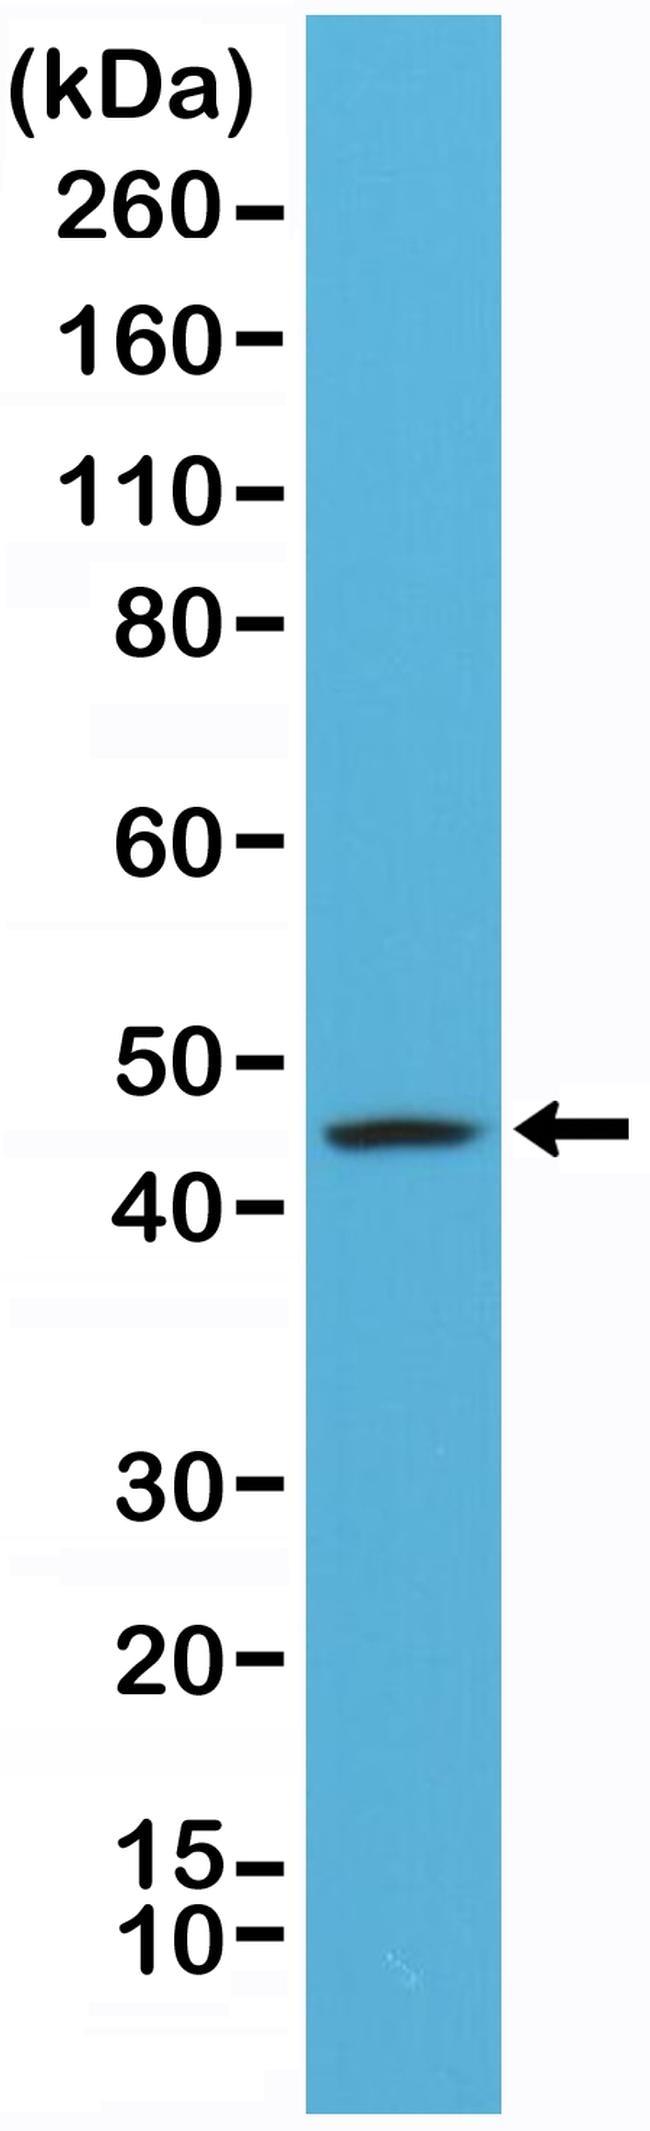 Cytokeratin 20 Antibody in Western Blot (WB)